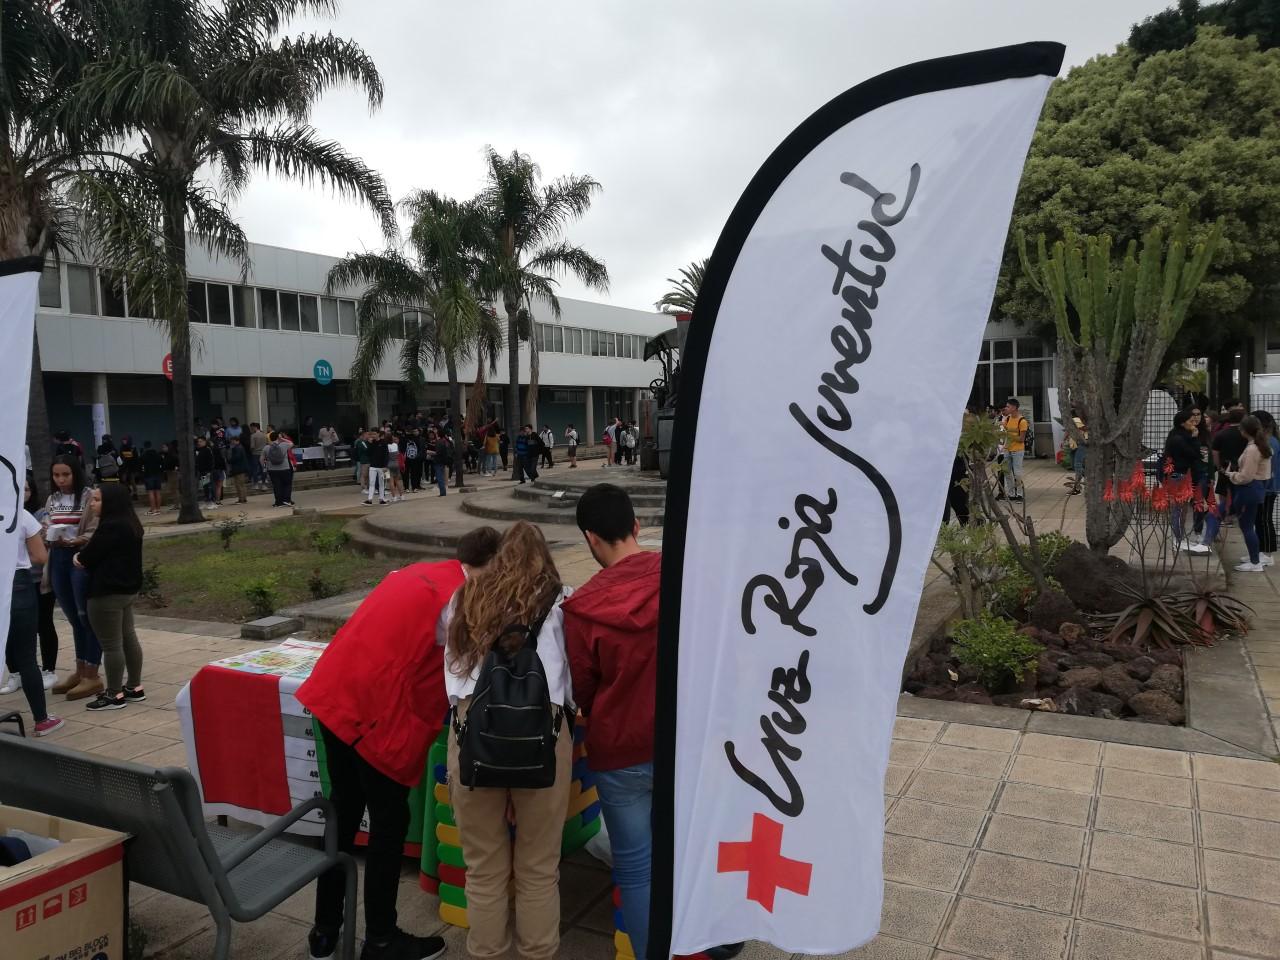 Cruz Roja/ canariasnoticias